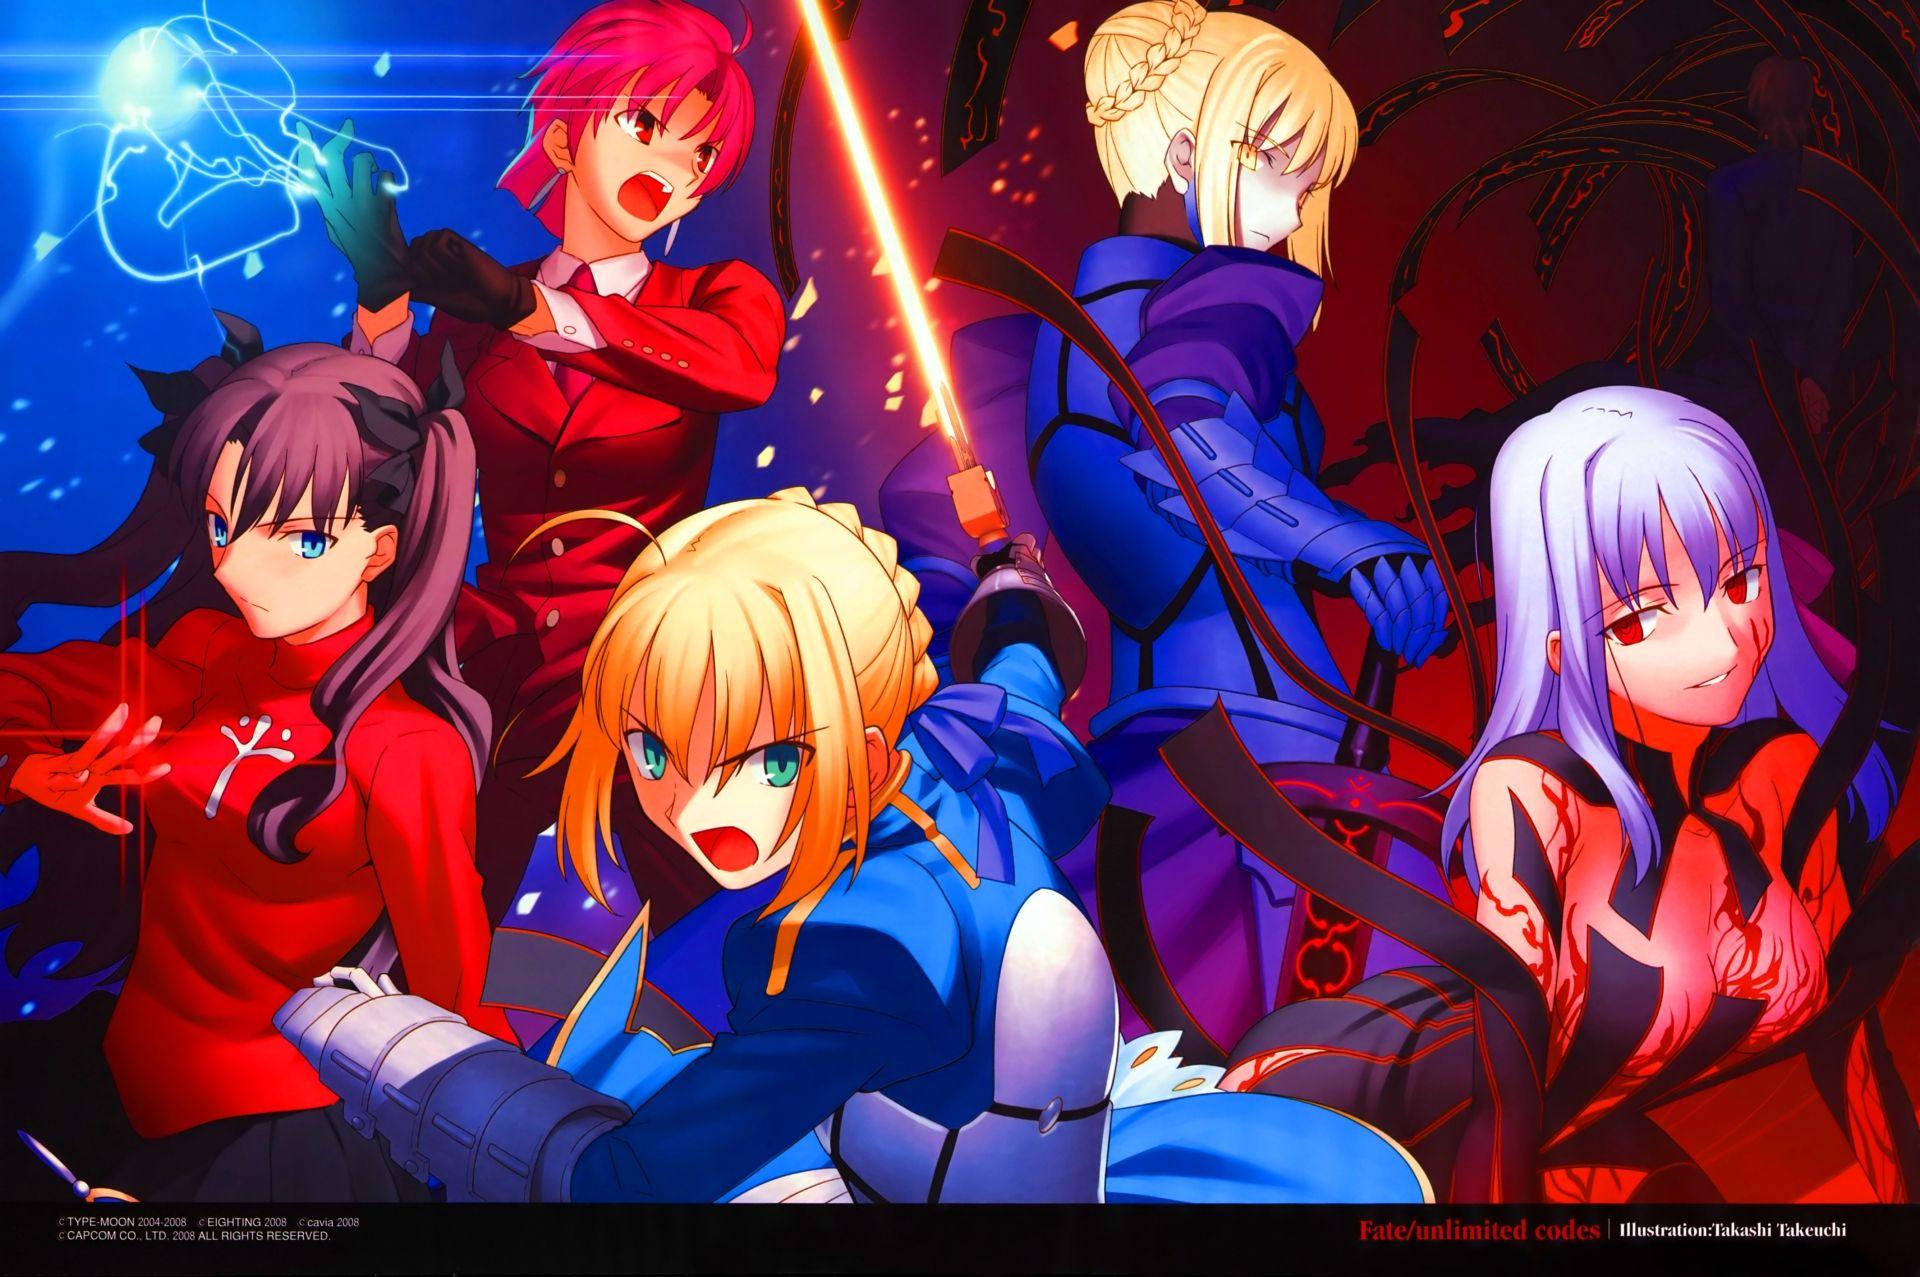 Minitokyo_Fate-Stay_Night_Scans_362932.jpg